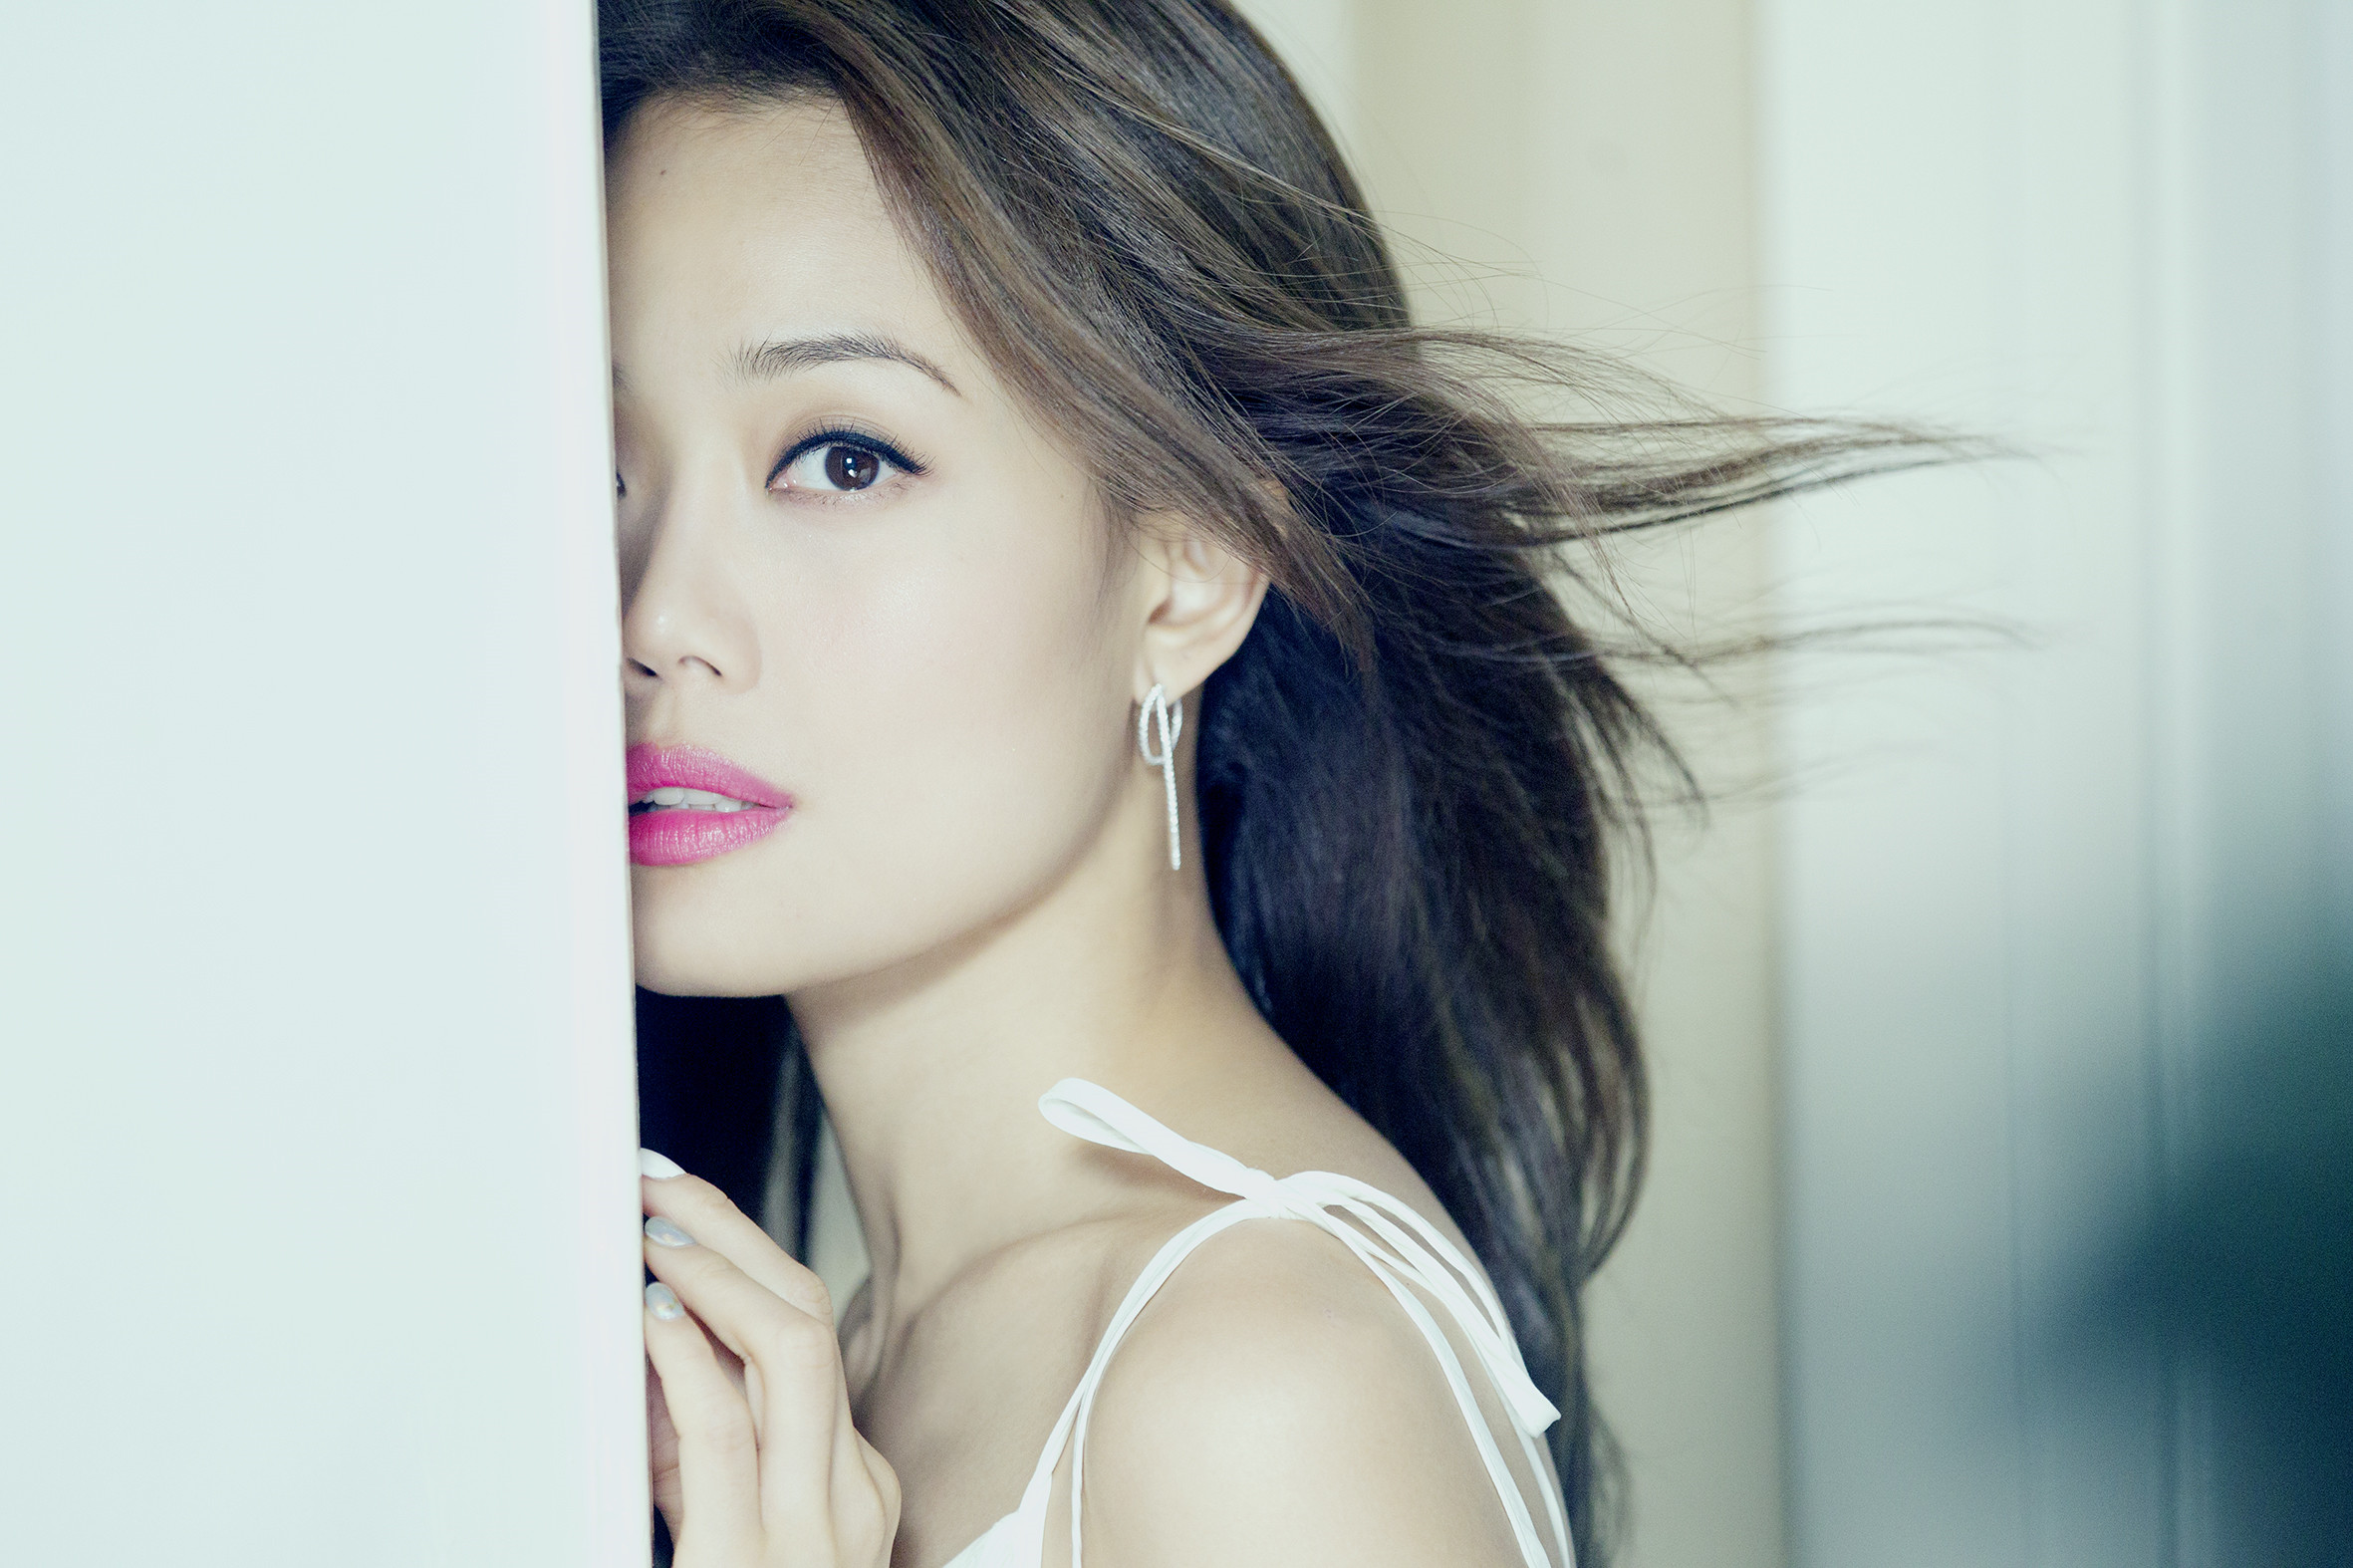 sexinsex|女星合成图 关晓彤 舒畅色情- www.aicuanw.xyz